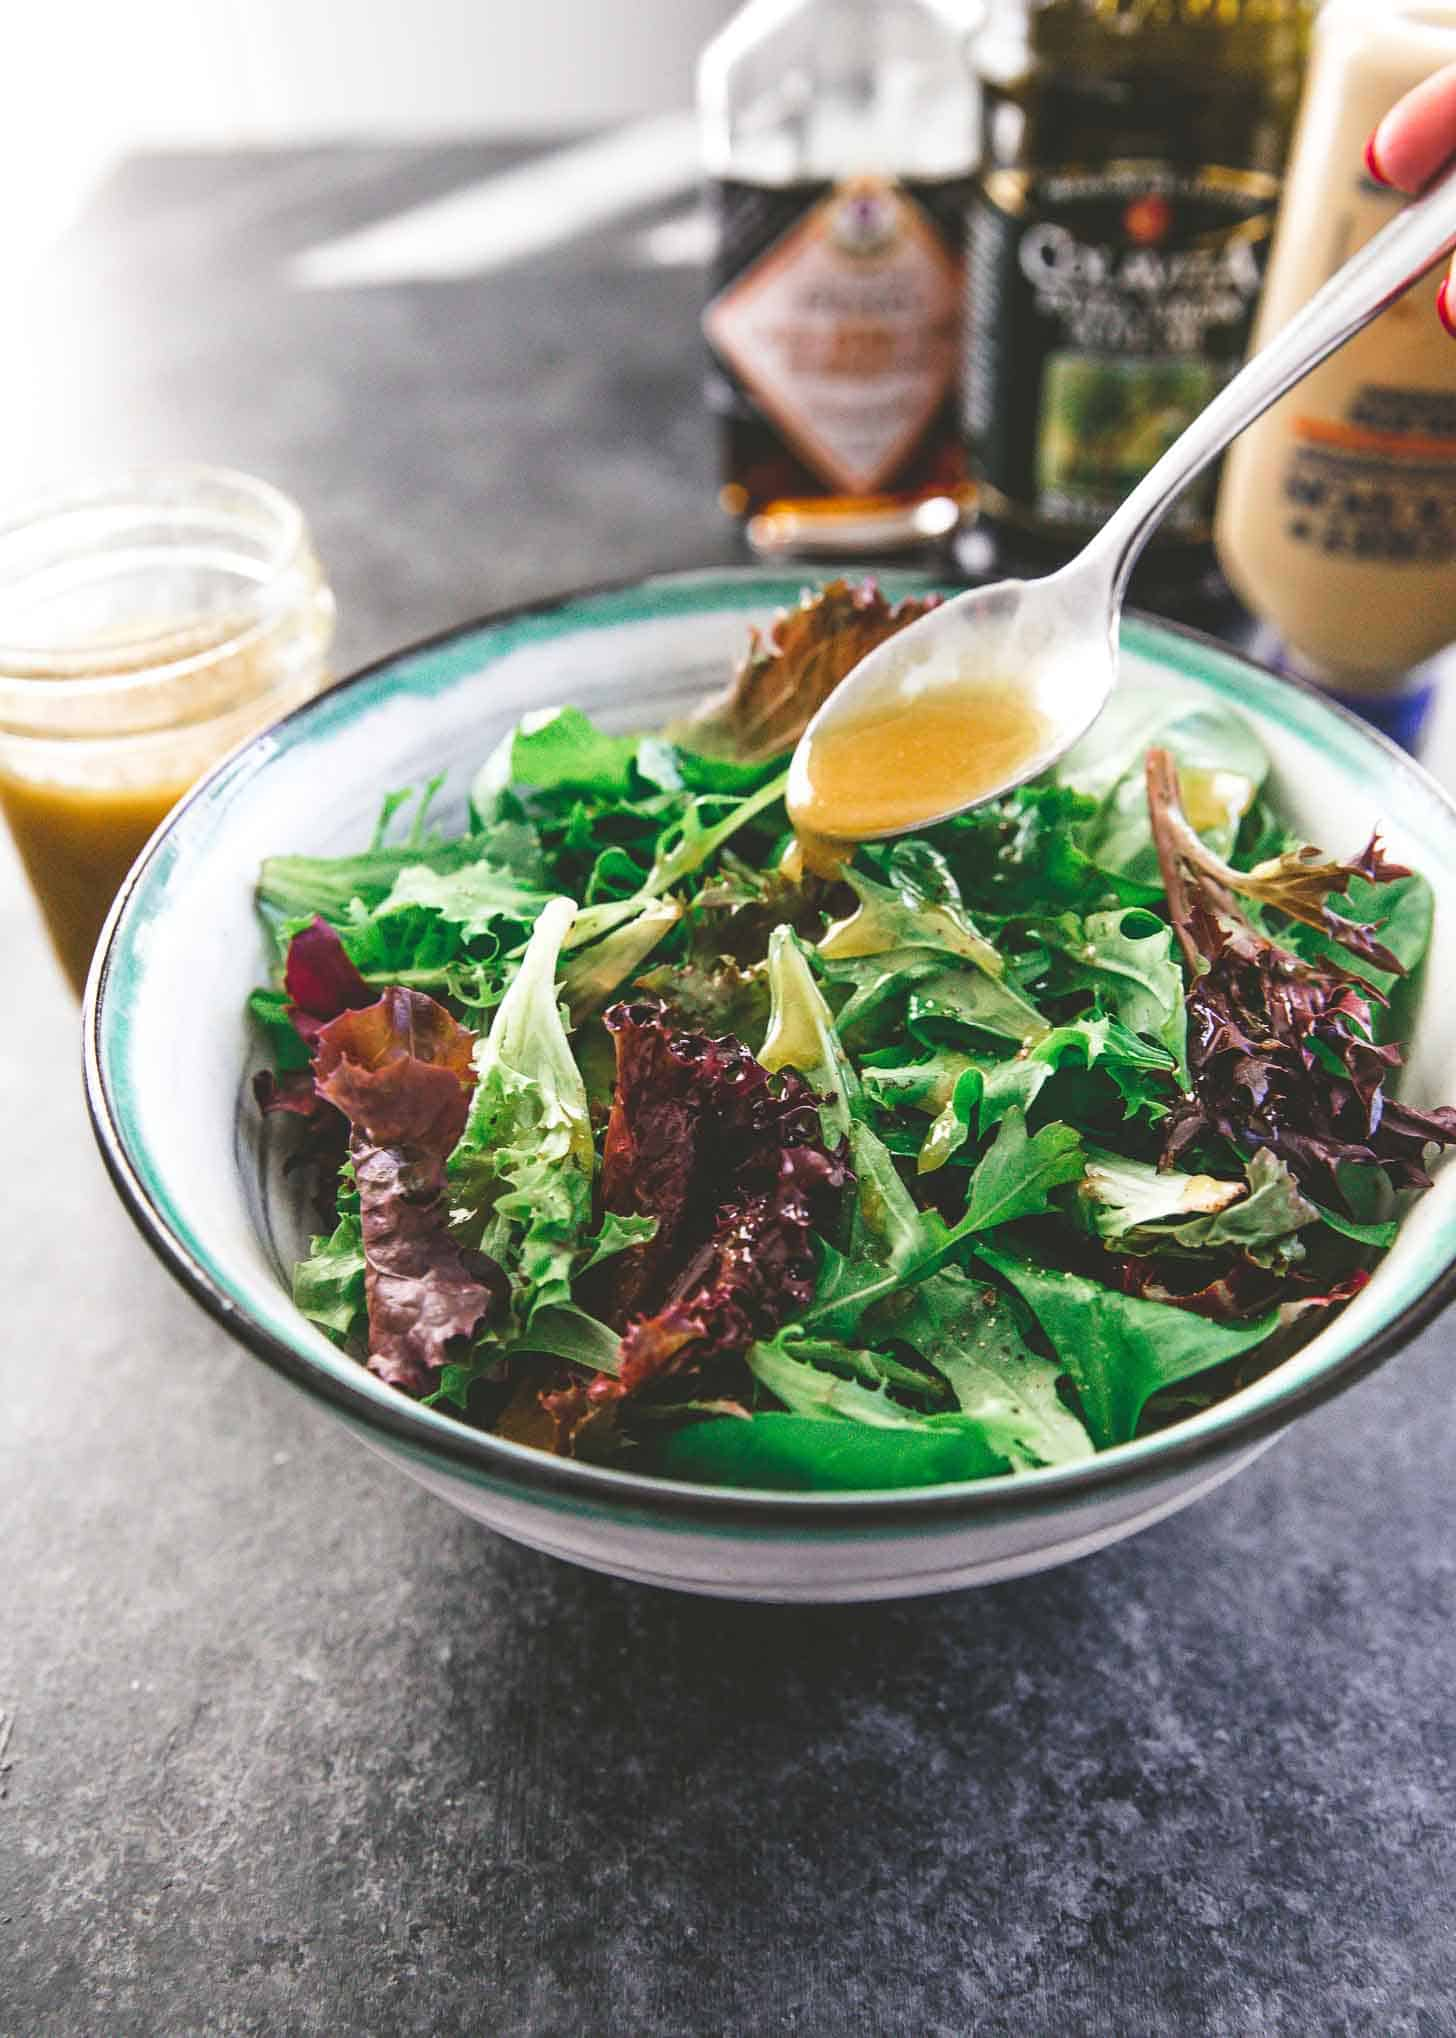 adding vinaigrette to salad